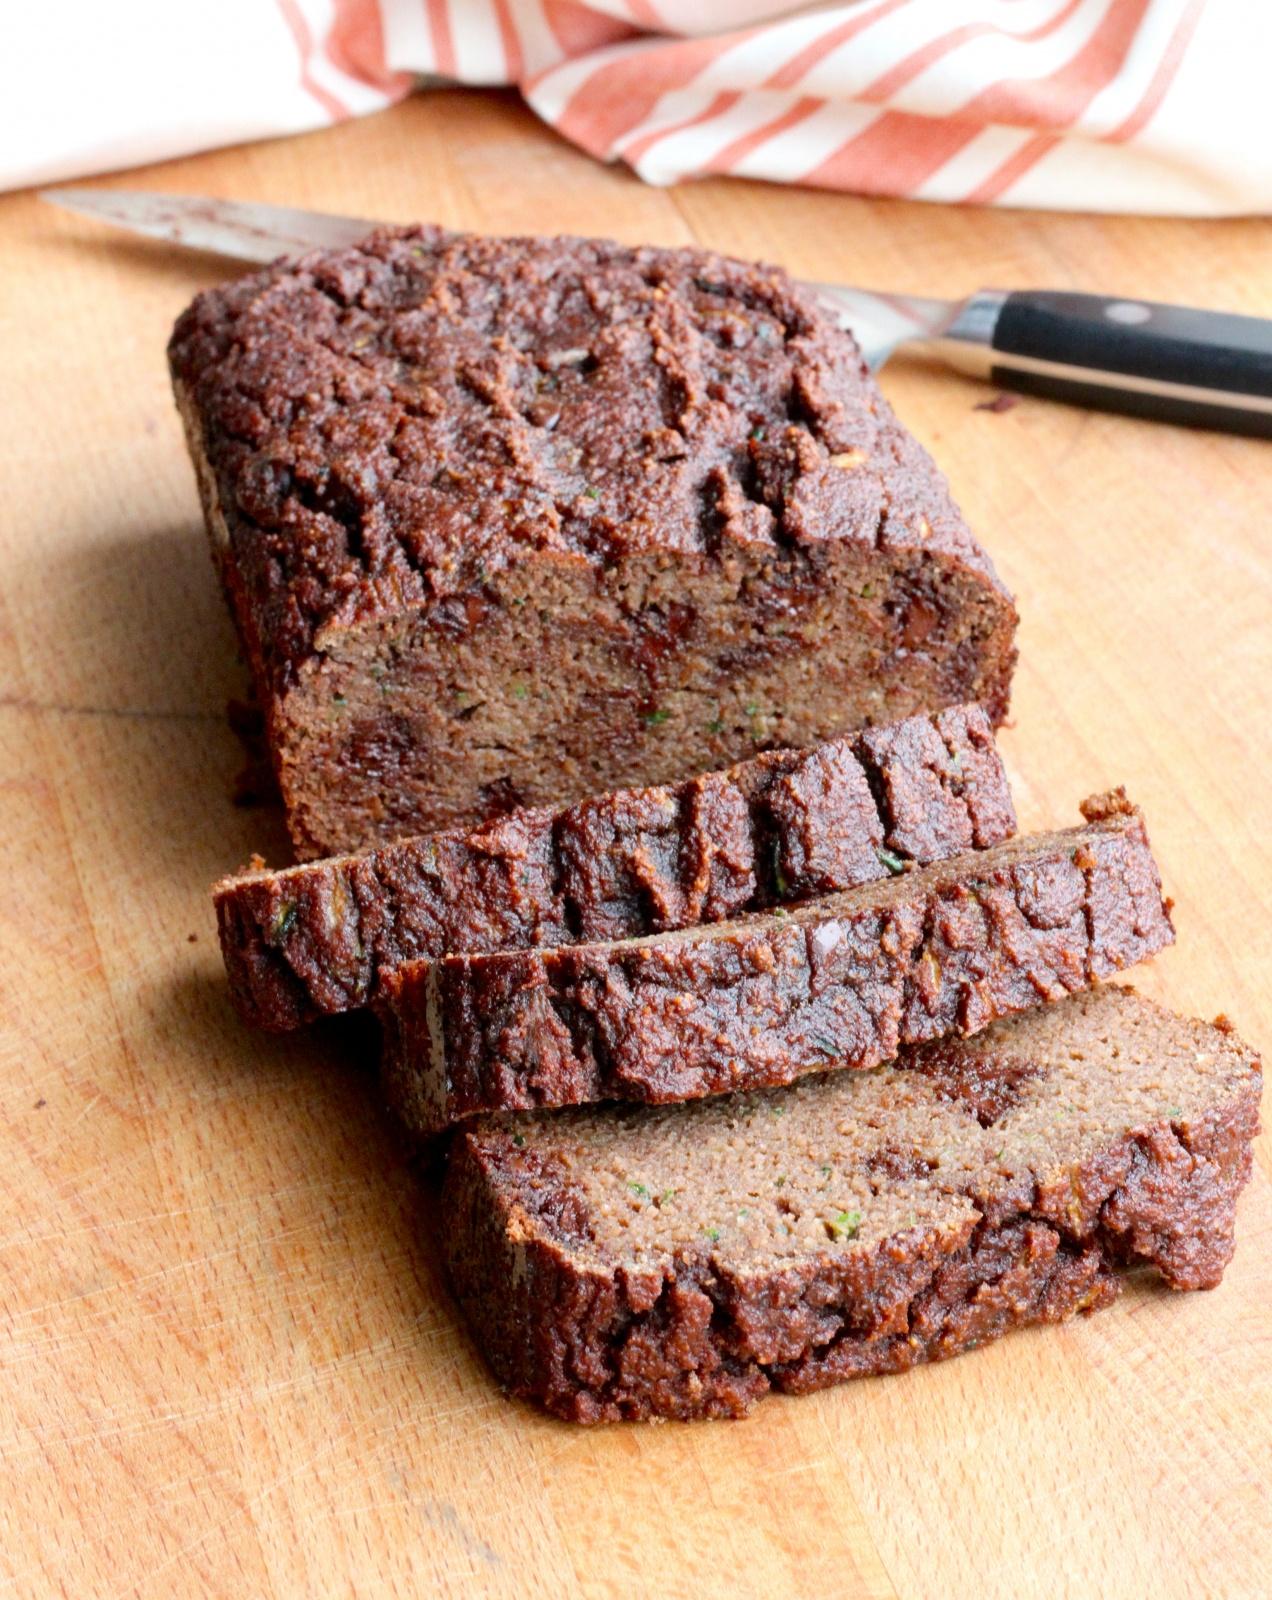 Grain-Free Chocolate Zucchini Bread from Down South Paleo